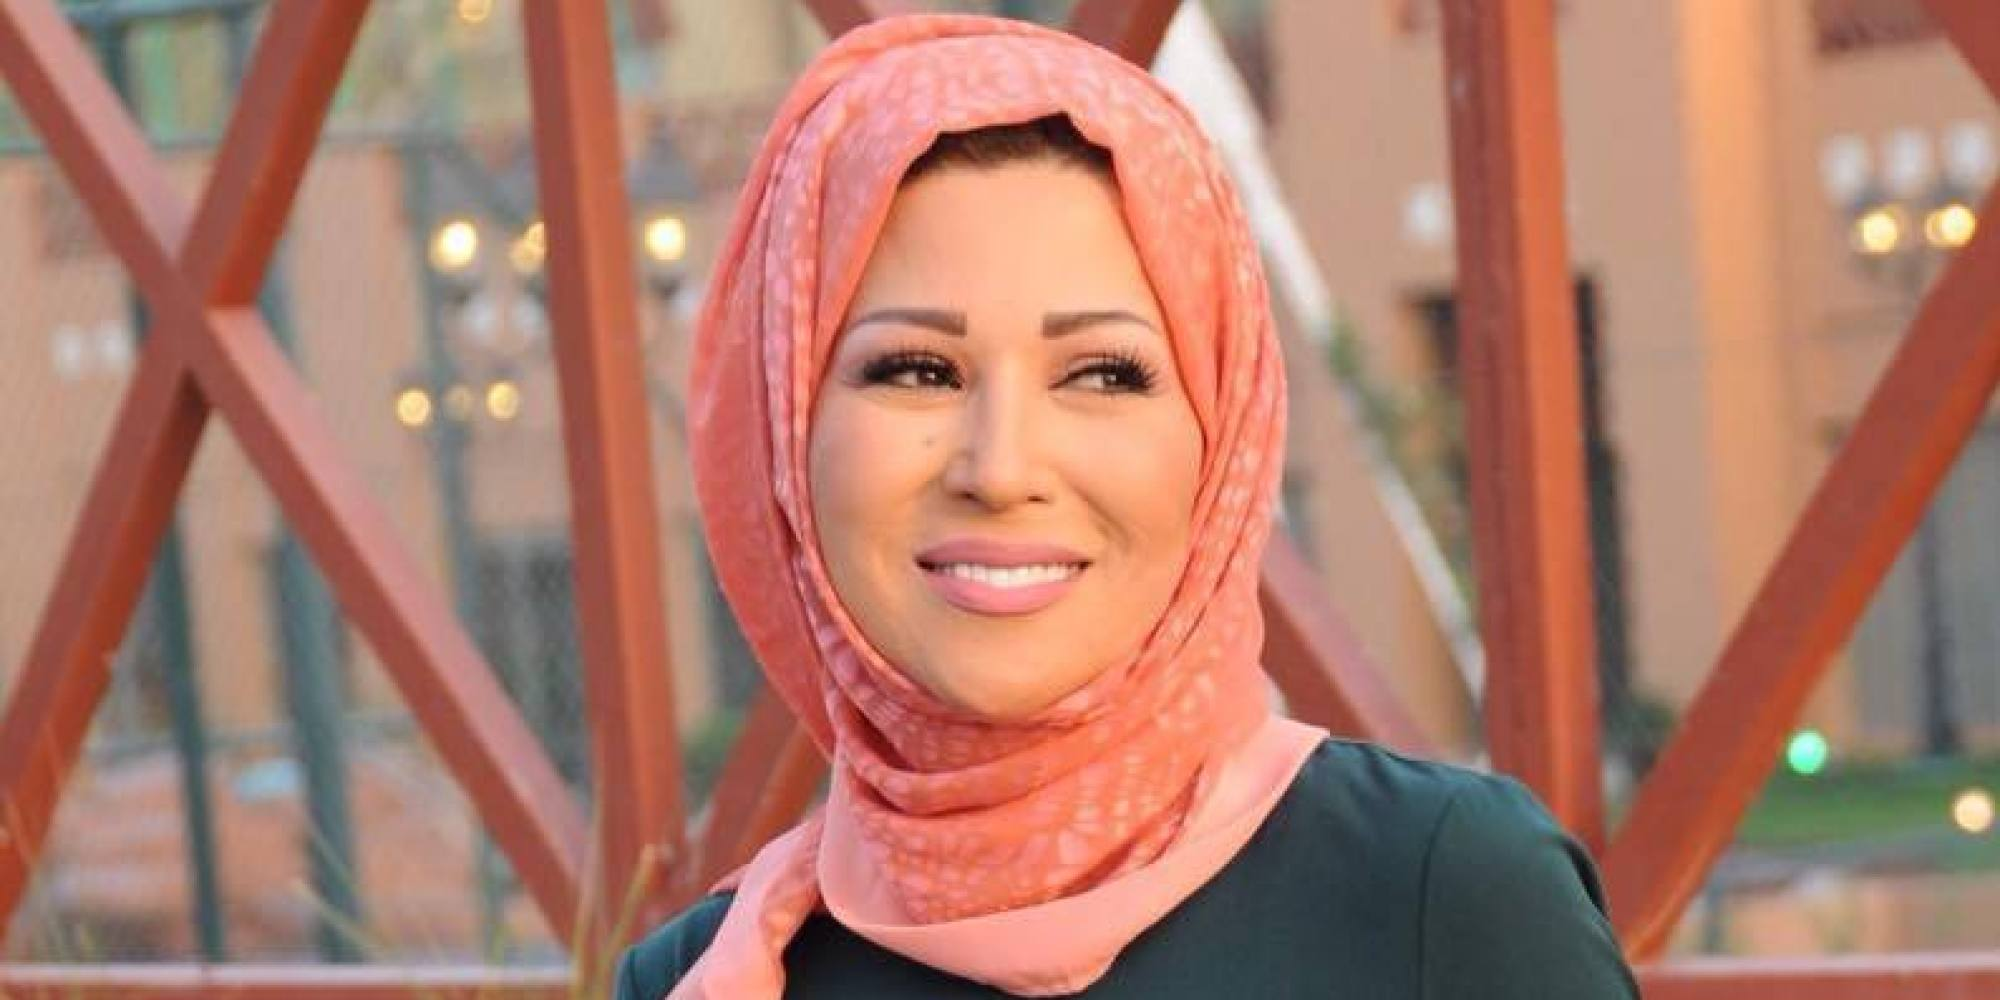 Khadidja Benguenna répond à Abdelmadjid Tebboune